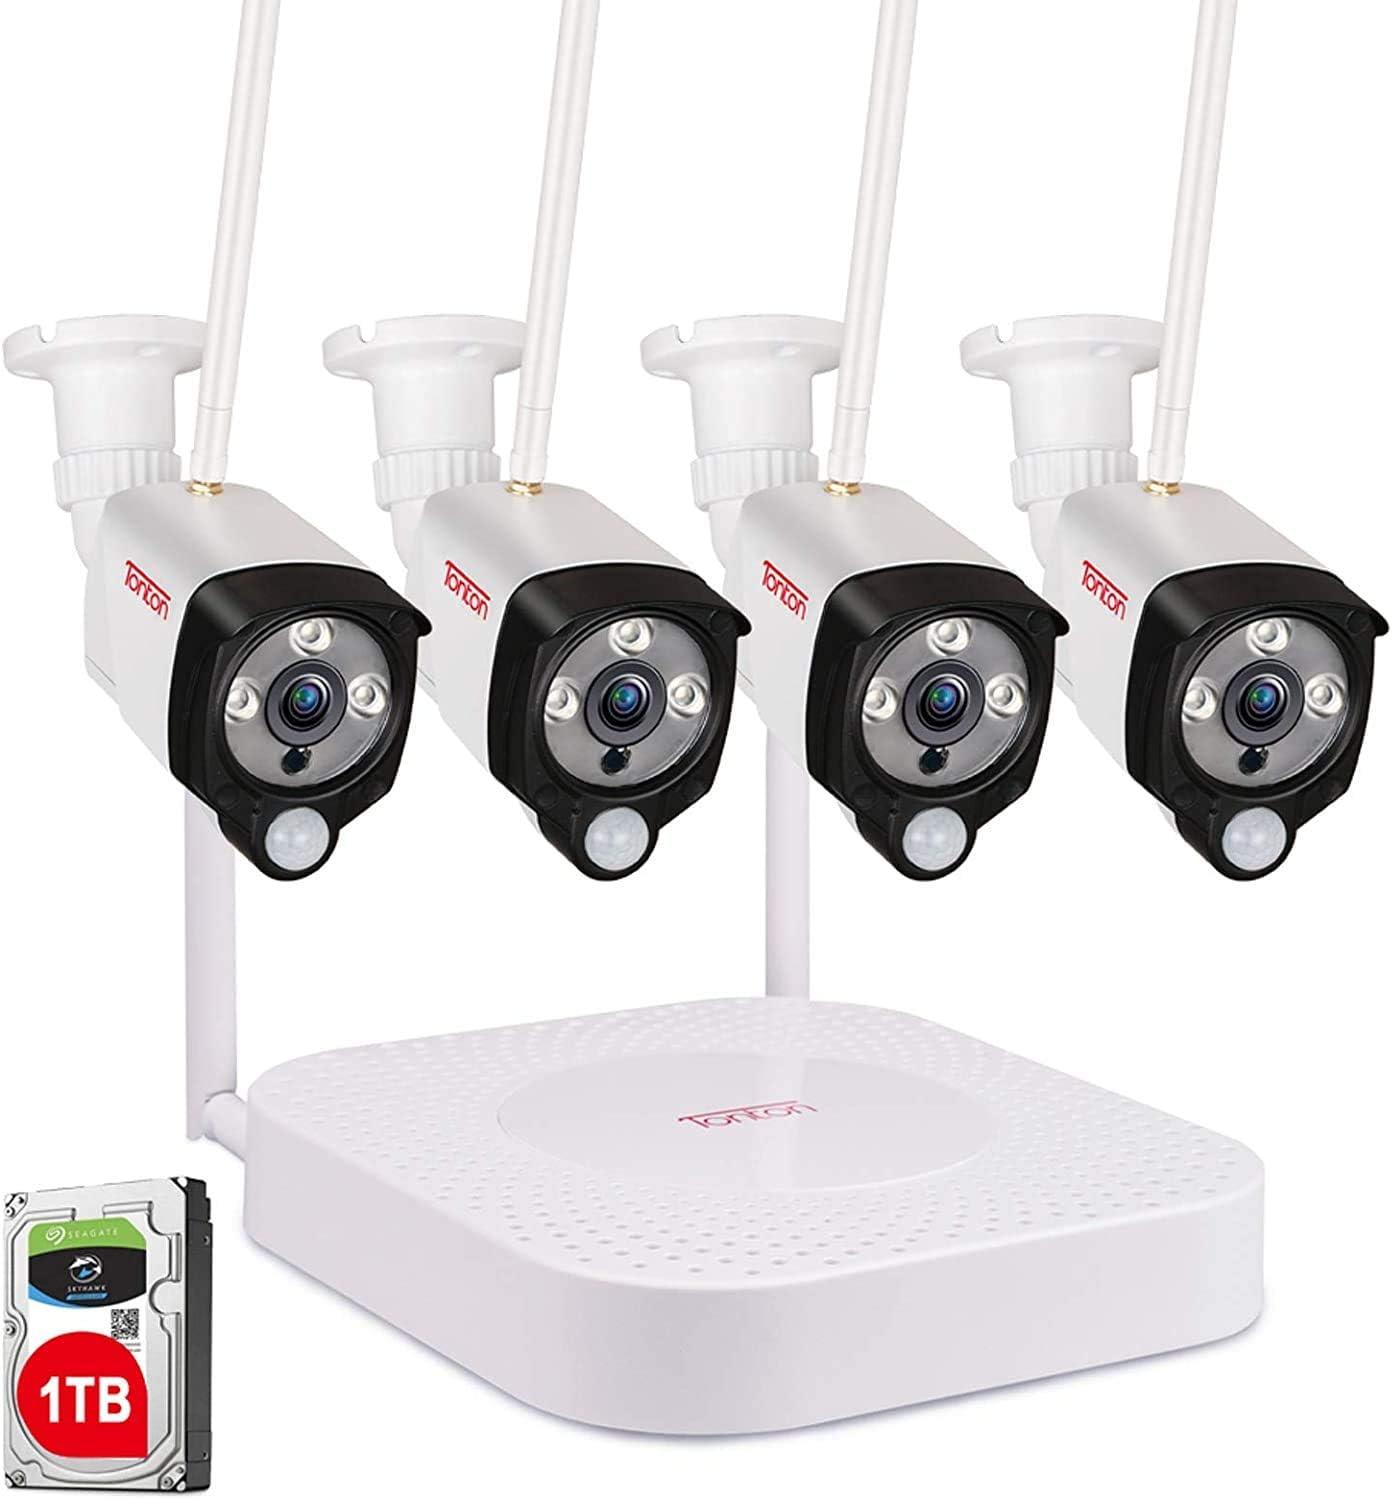 Sistema de cámaras de Seguridad inalámbricas Full HD 1080p Tonton, grabadora NVR 8CH con HDD de 1 TB y 4PCS 2.0 MP Cámaras de Bala Interiores para Interiores, Impermeables.